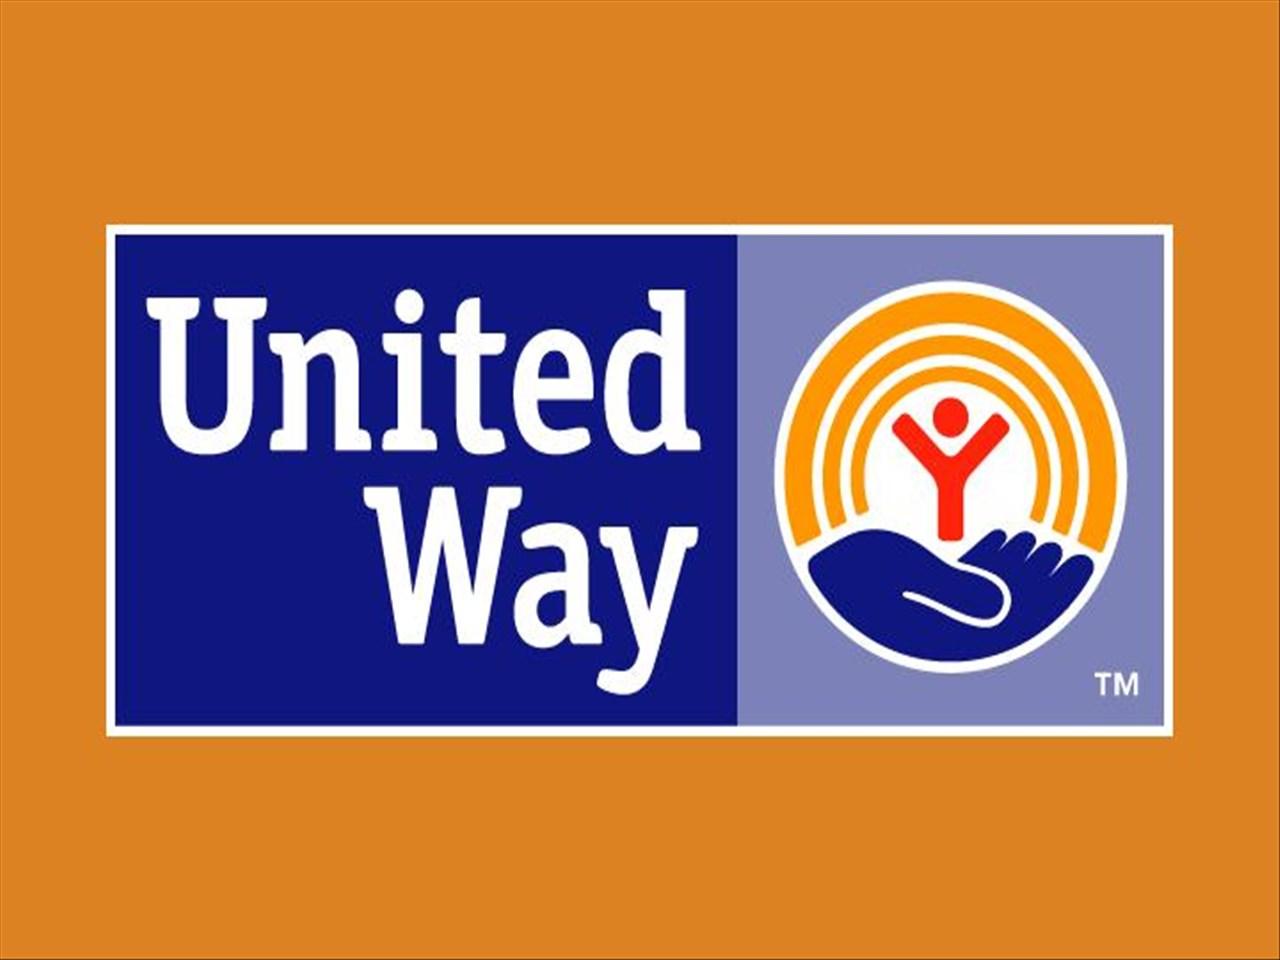 United Way_395264